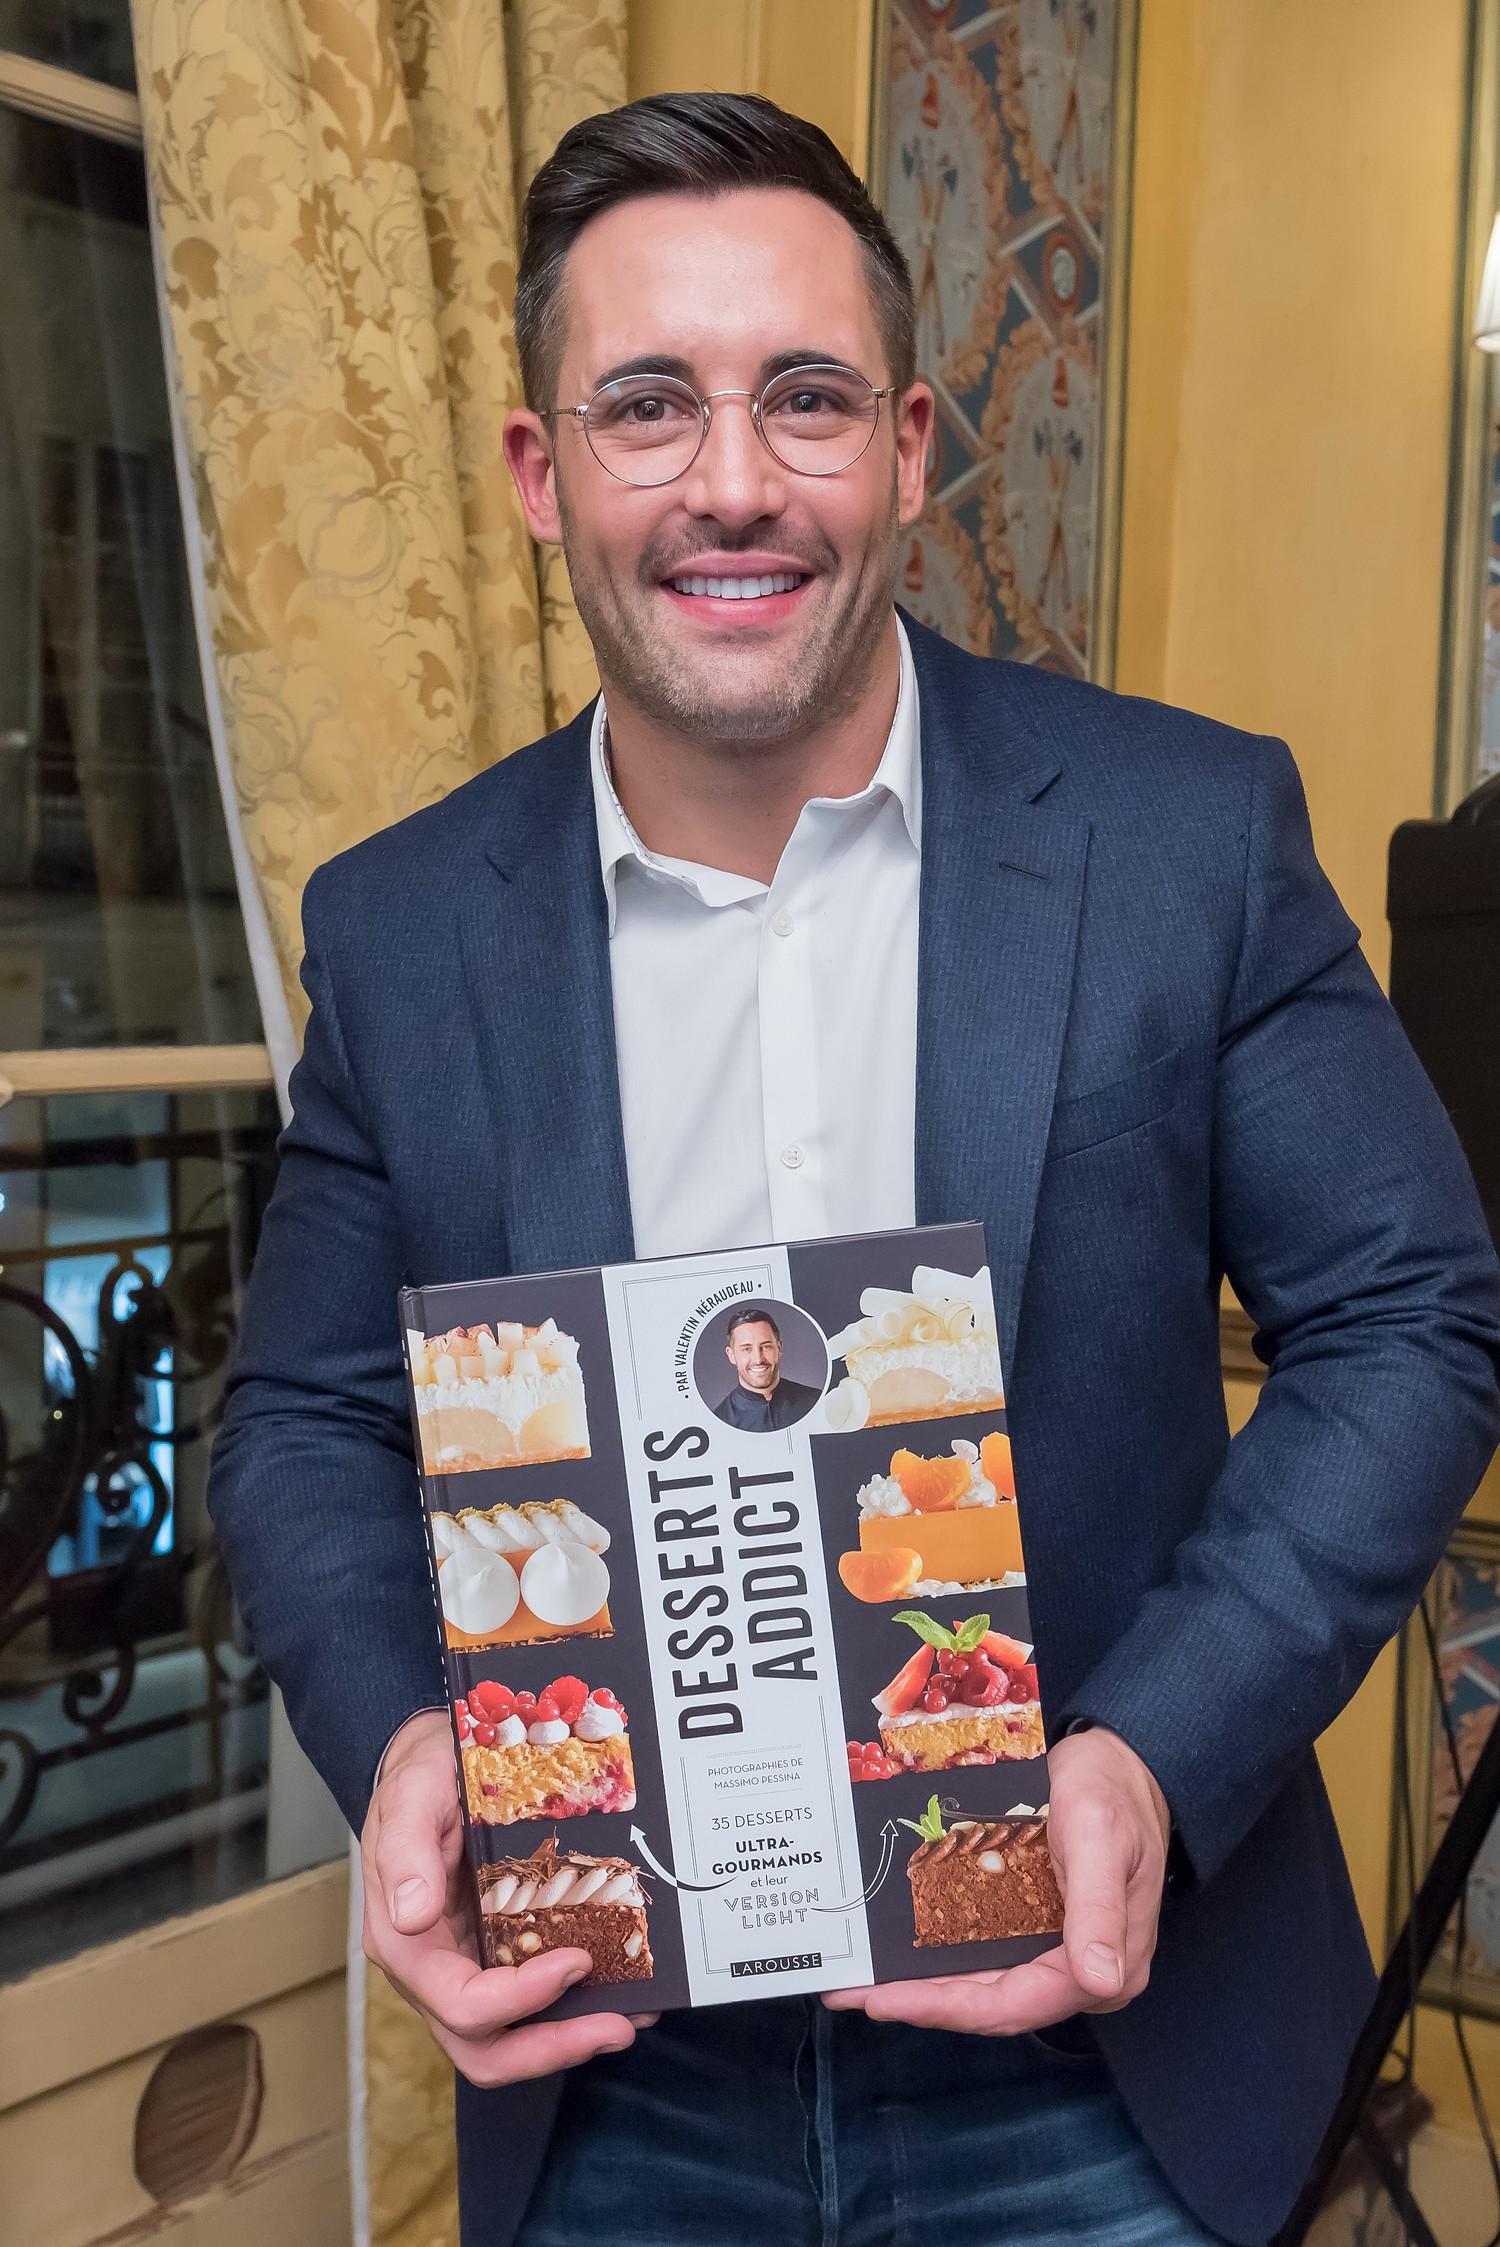 NERAUDEAU Valentin Prix Procope 2019 pour desserts addict